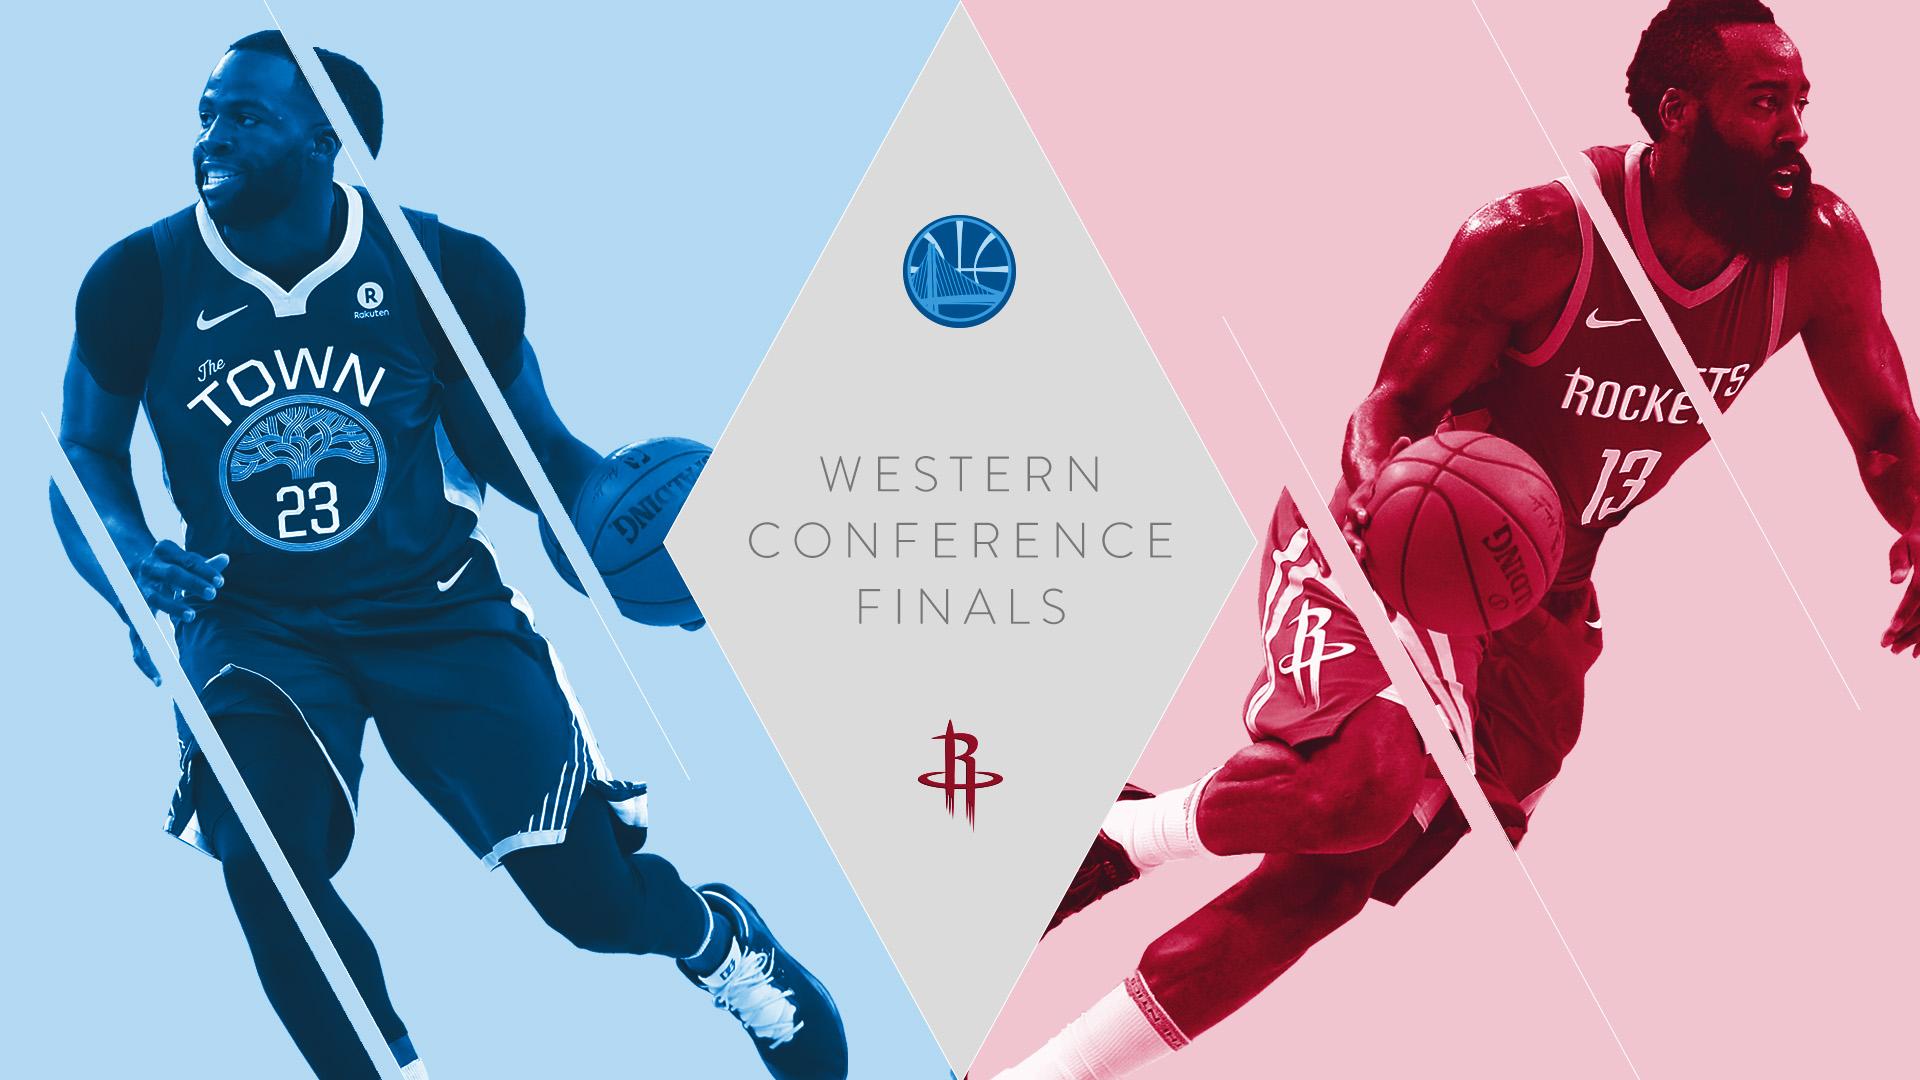 Warriors take advantage of Rockets' cold streak, win Game 7 in Houston | NBA.com